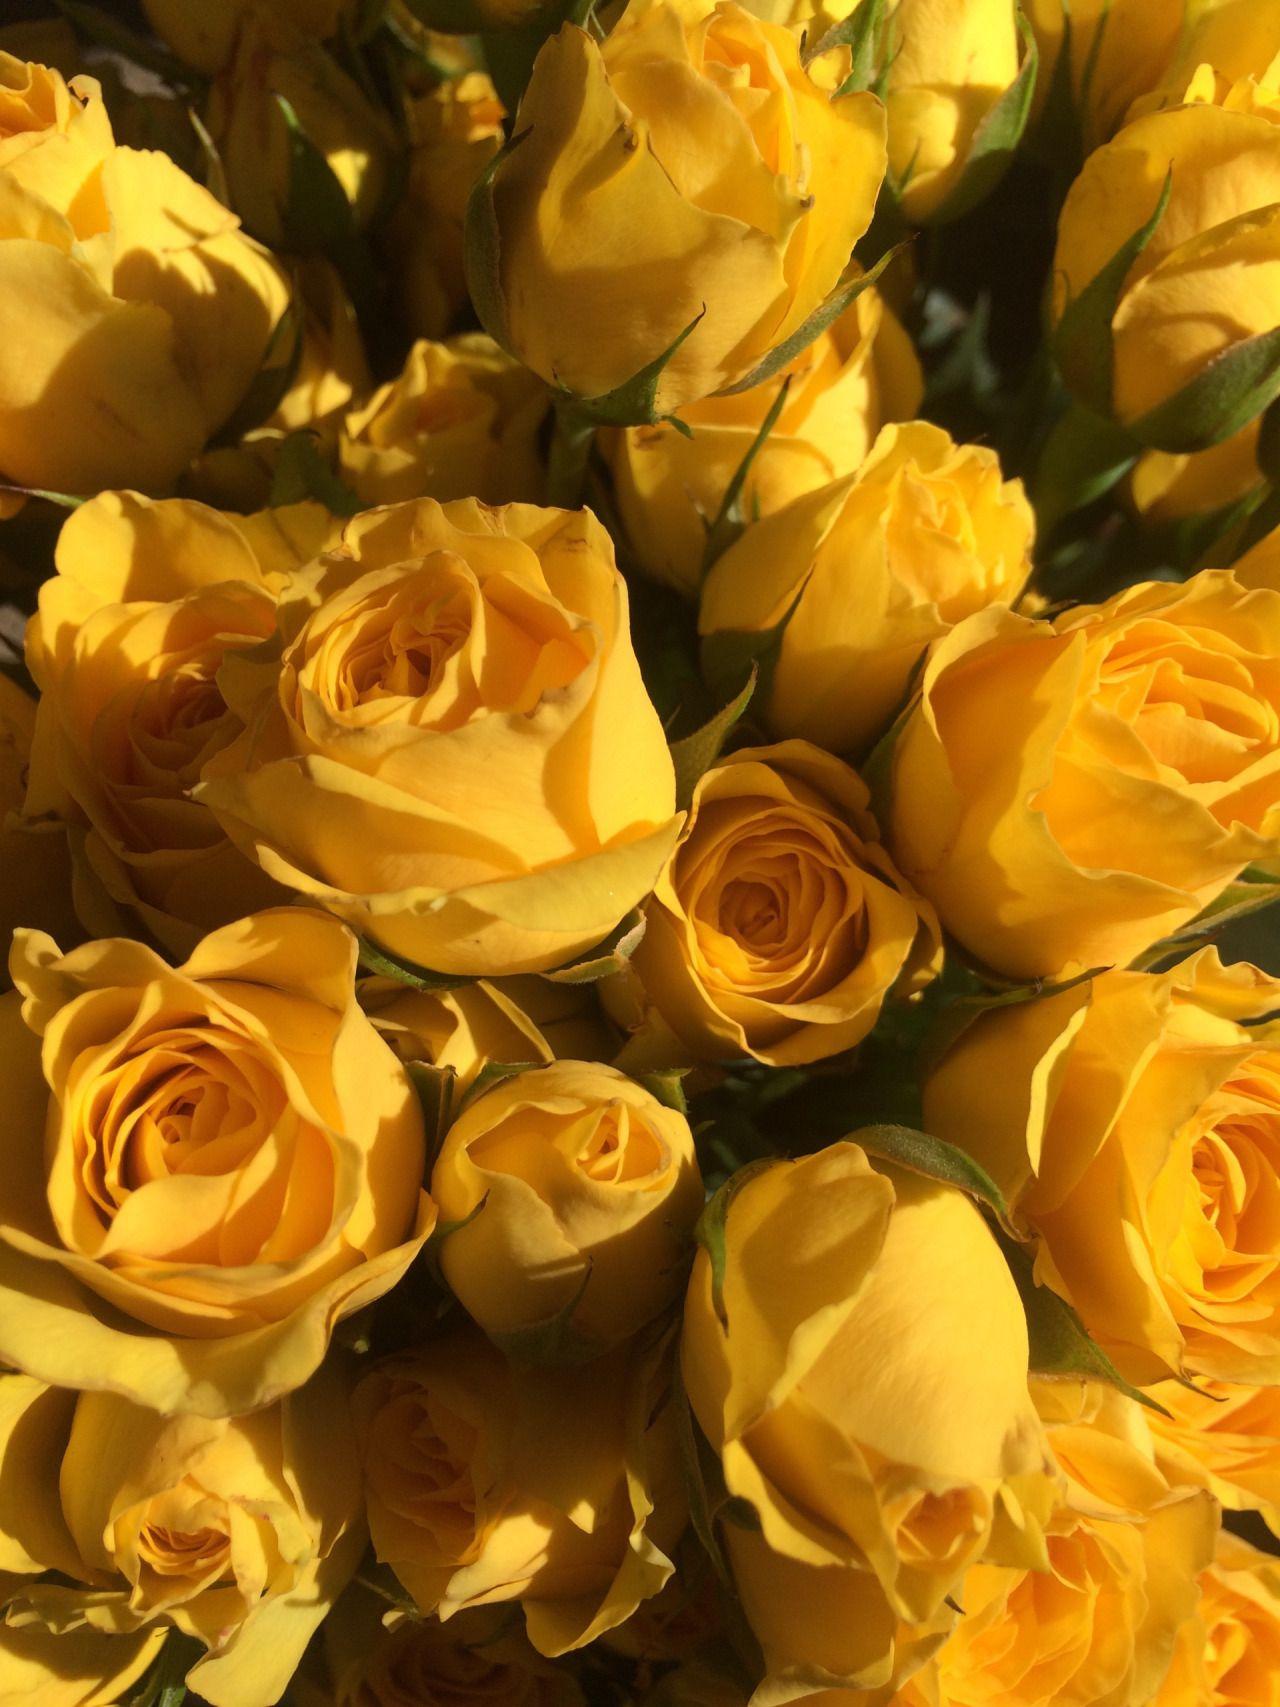 flowers Tumblr Yellow aesthetic, Yellow roses, Yellow